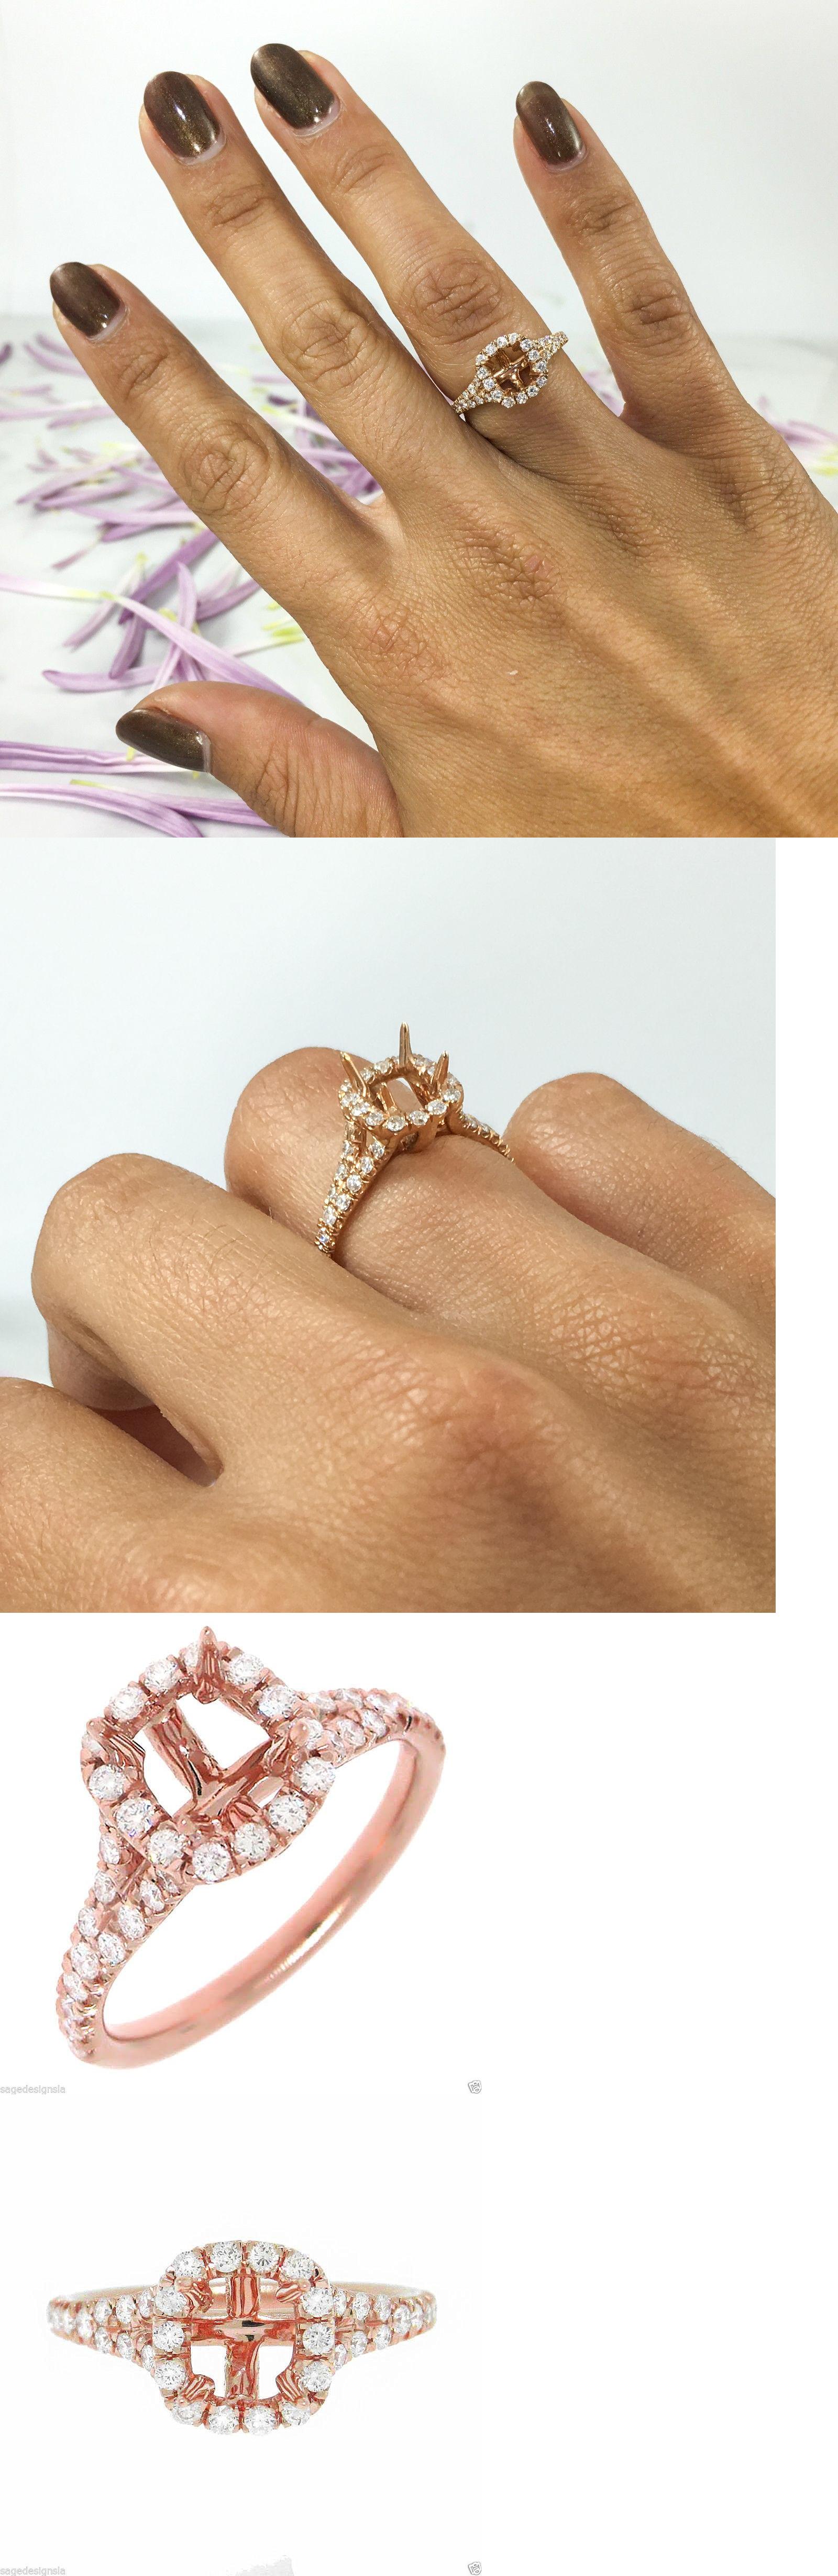 Settings Only 164309: 6x5mm Emerald Cushion Semi Mount 18k Rose Gold  Diamond Engagement Ring Setting